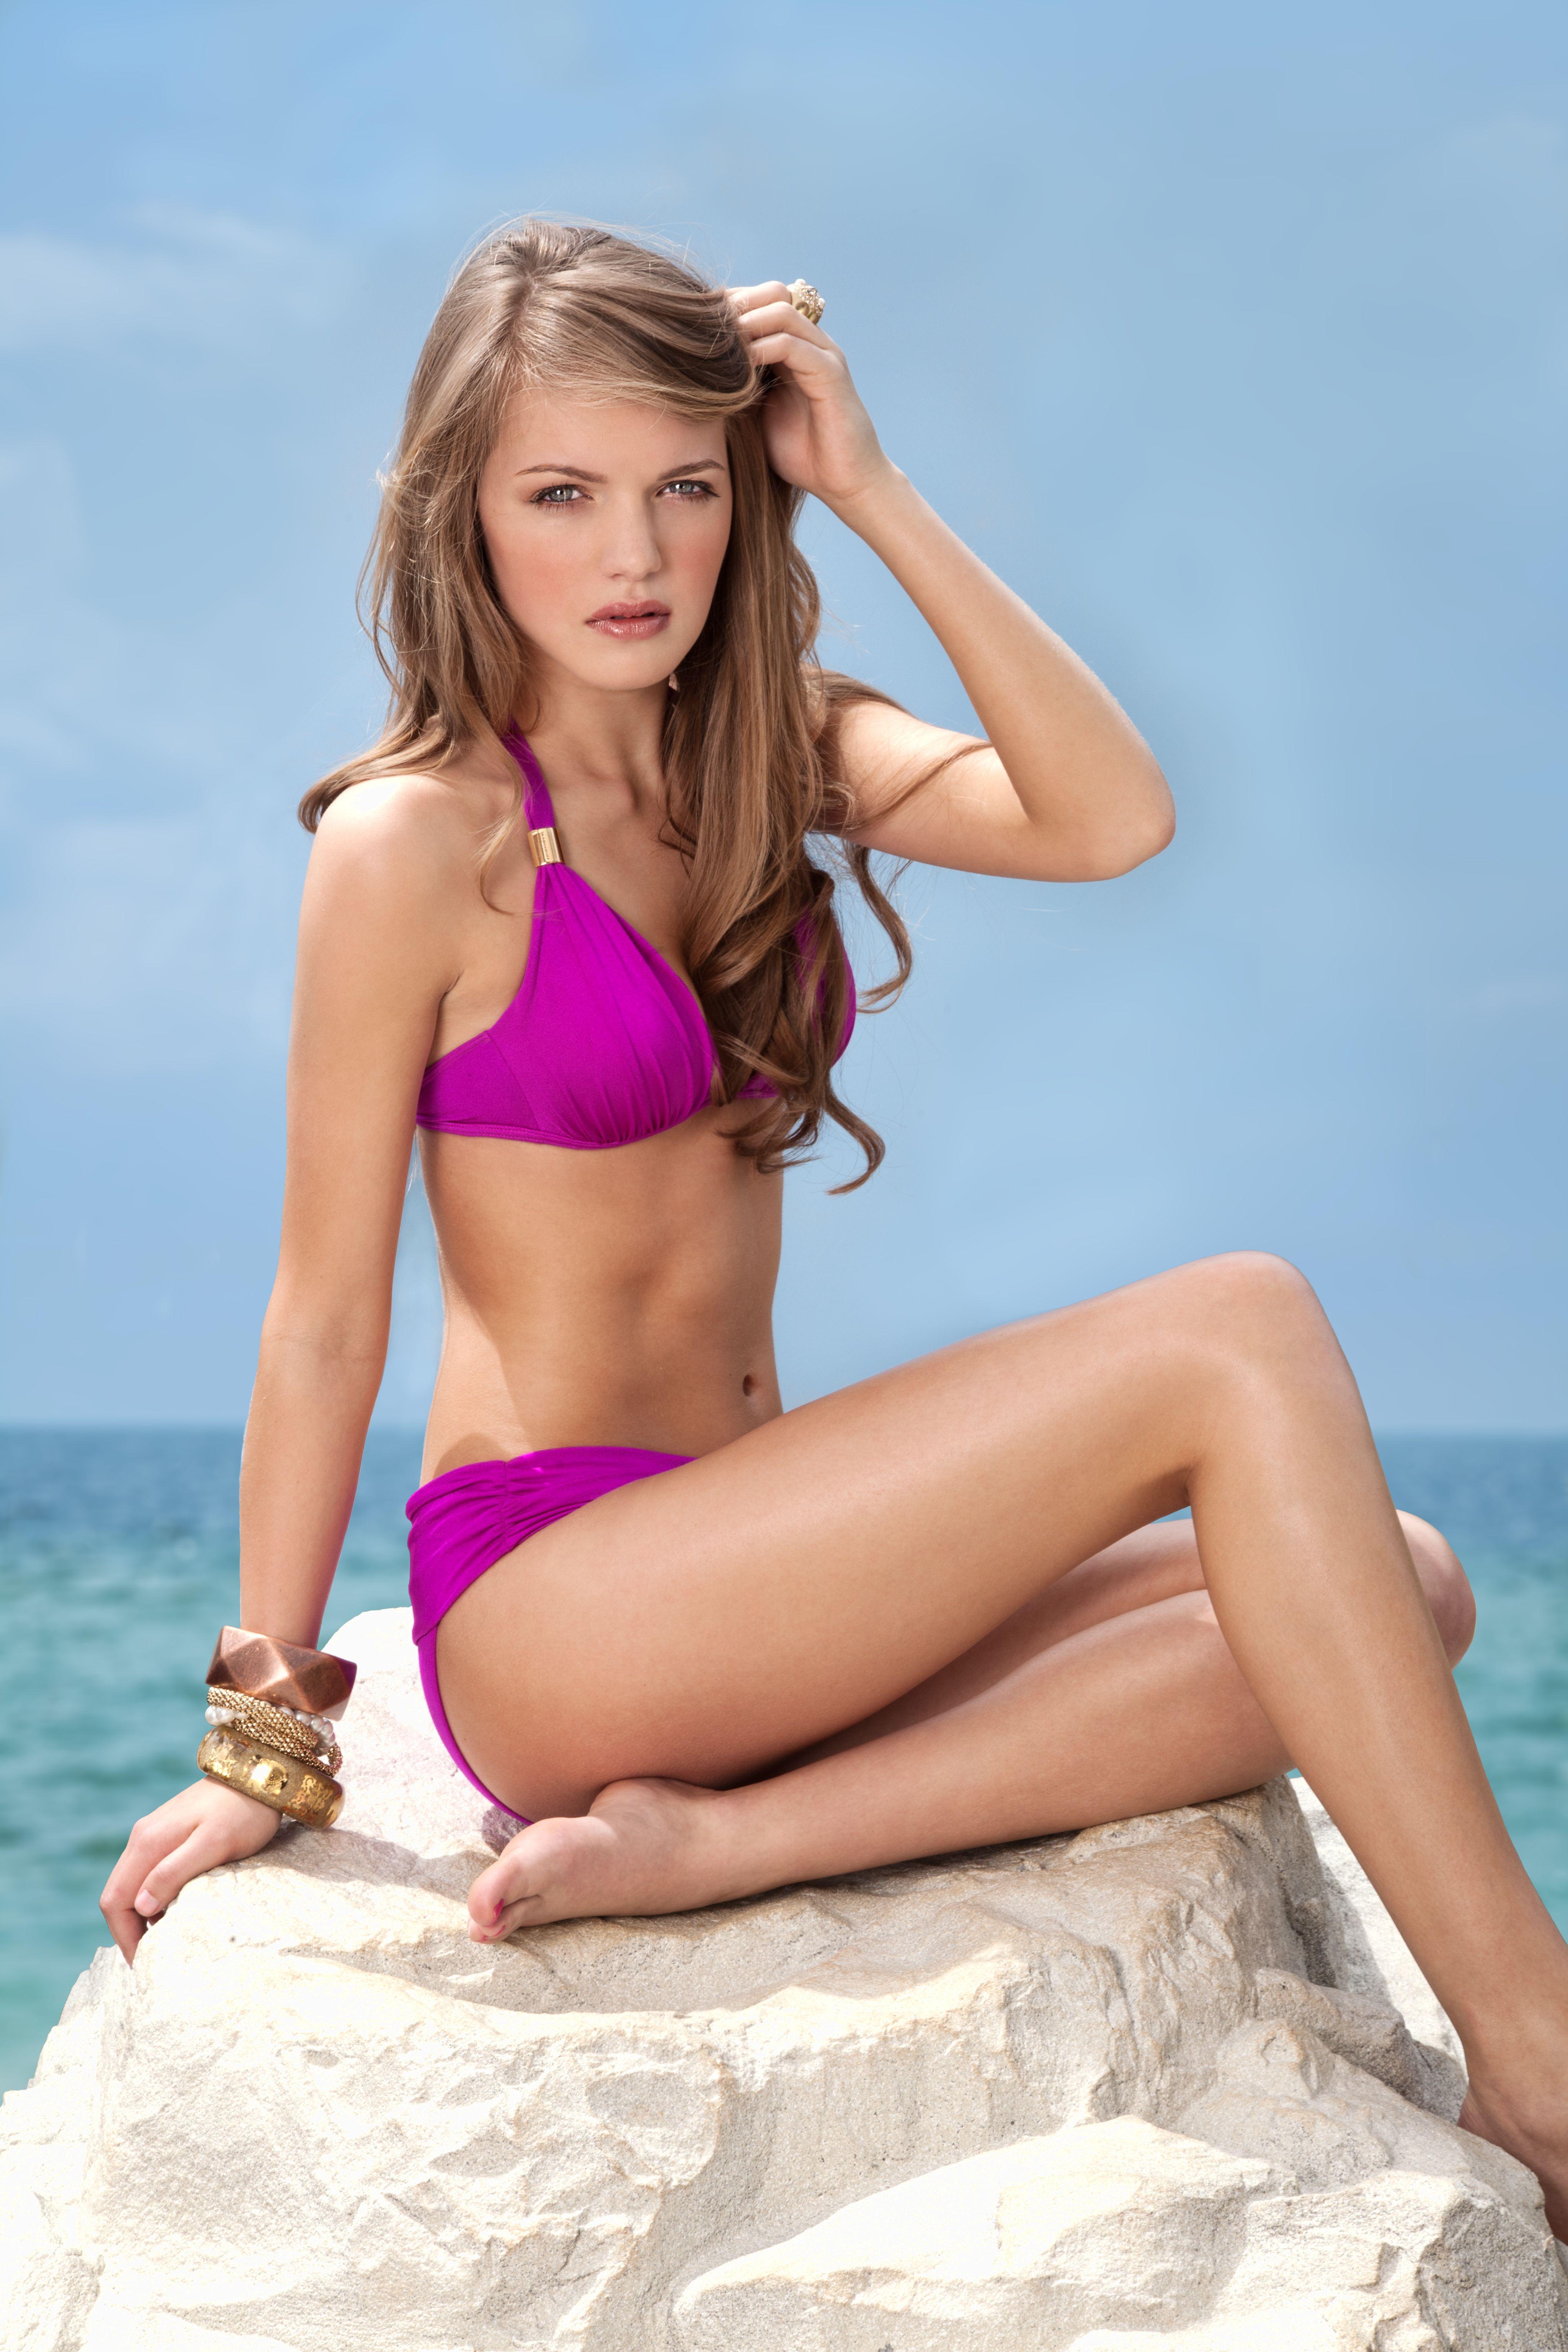 imgchili  sex junior Amanda Gullickson @ ONE model management and Wilhelmina Miami